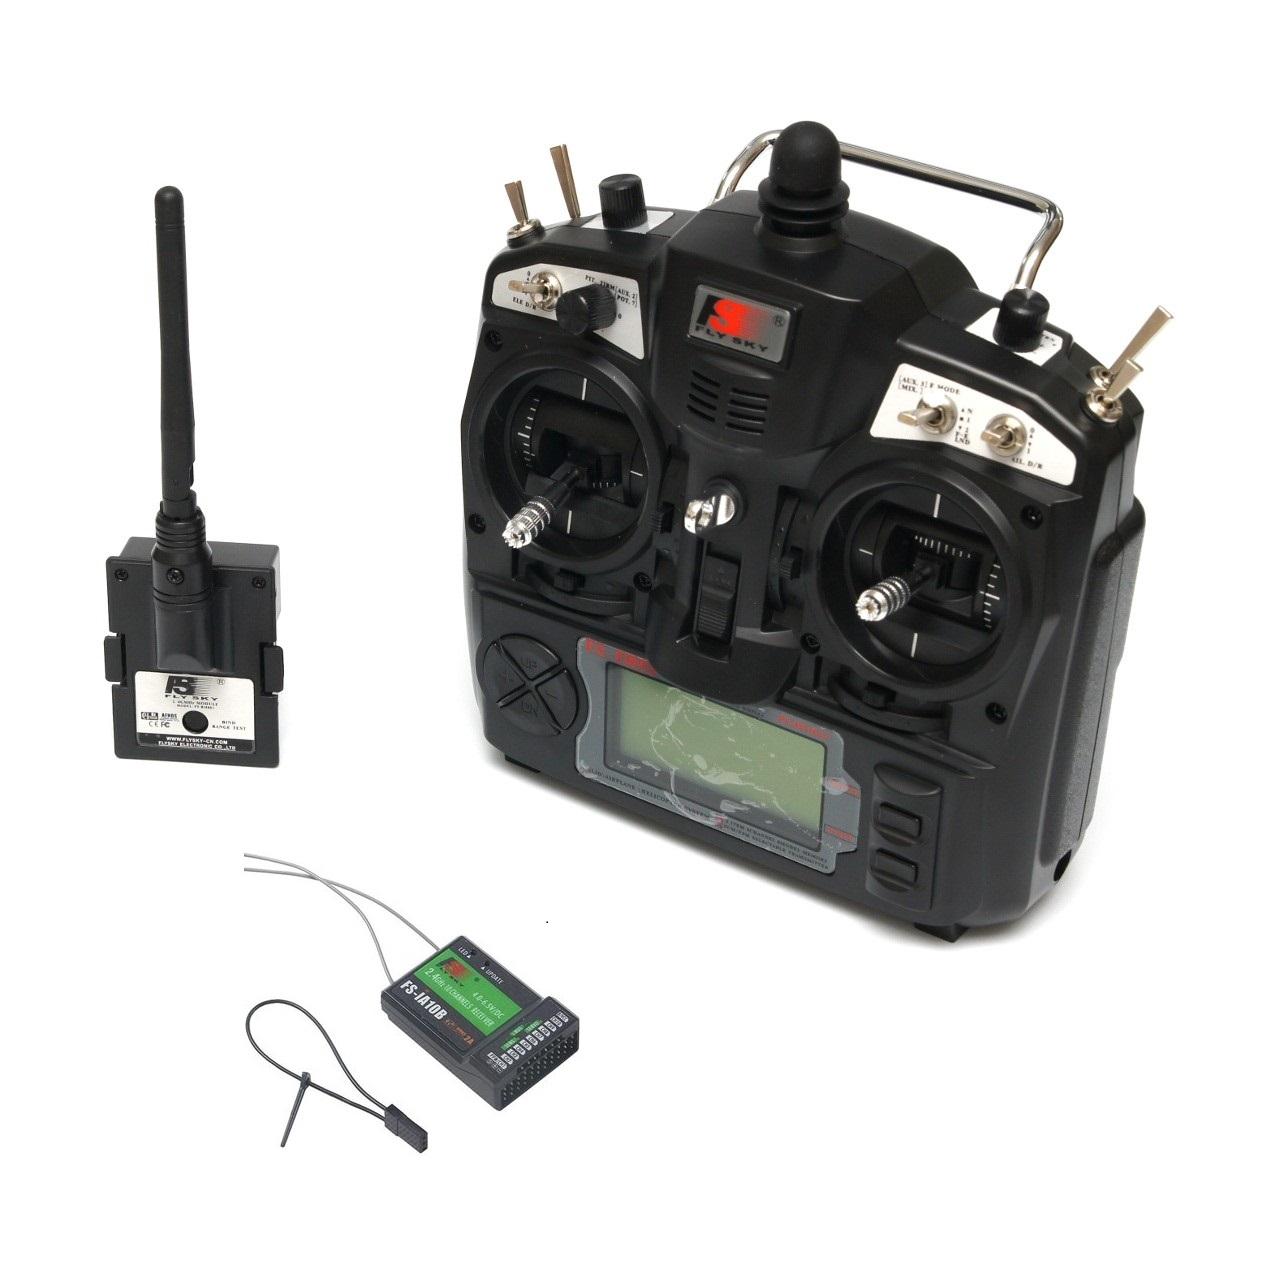 FS-TH9X 2 4GHz 9CH Upgrade Transmitter with FS-IA10B Receiver